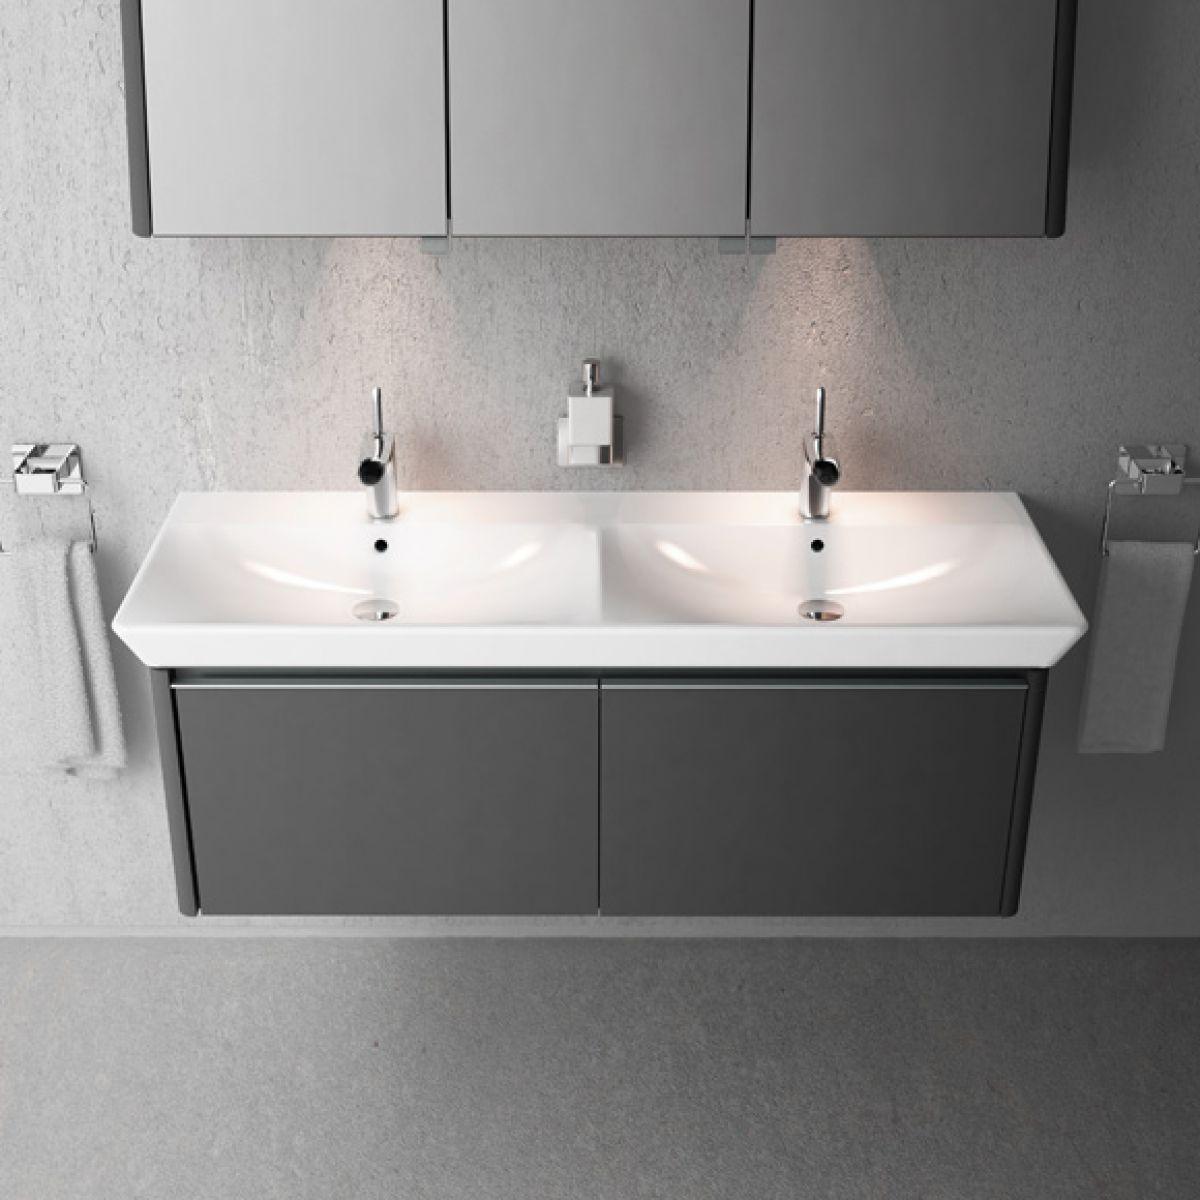 product image for vitra t4 130cm vanity unit double basin